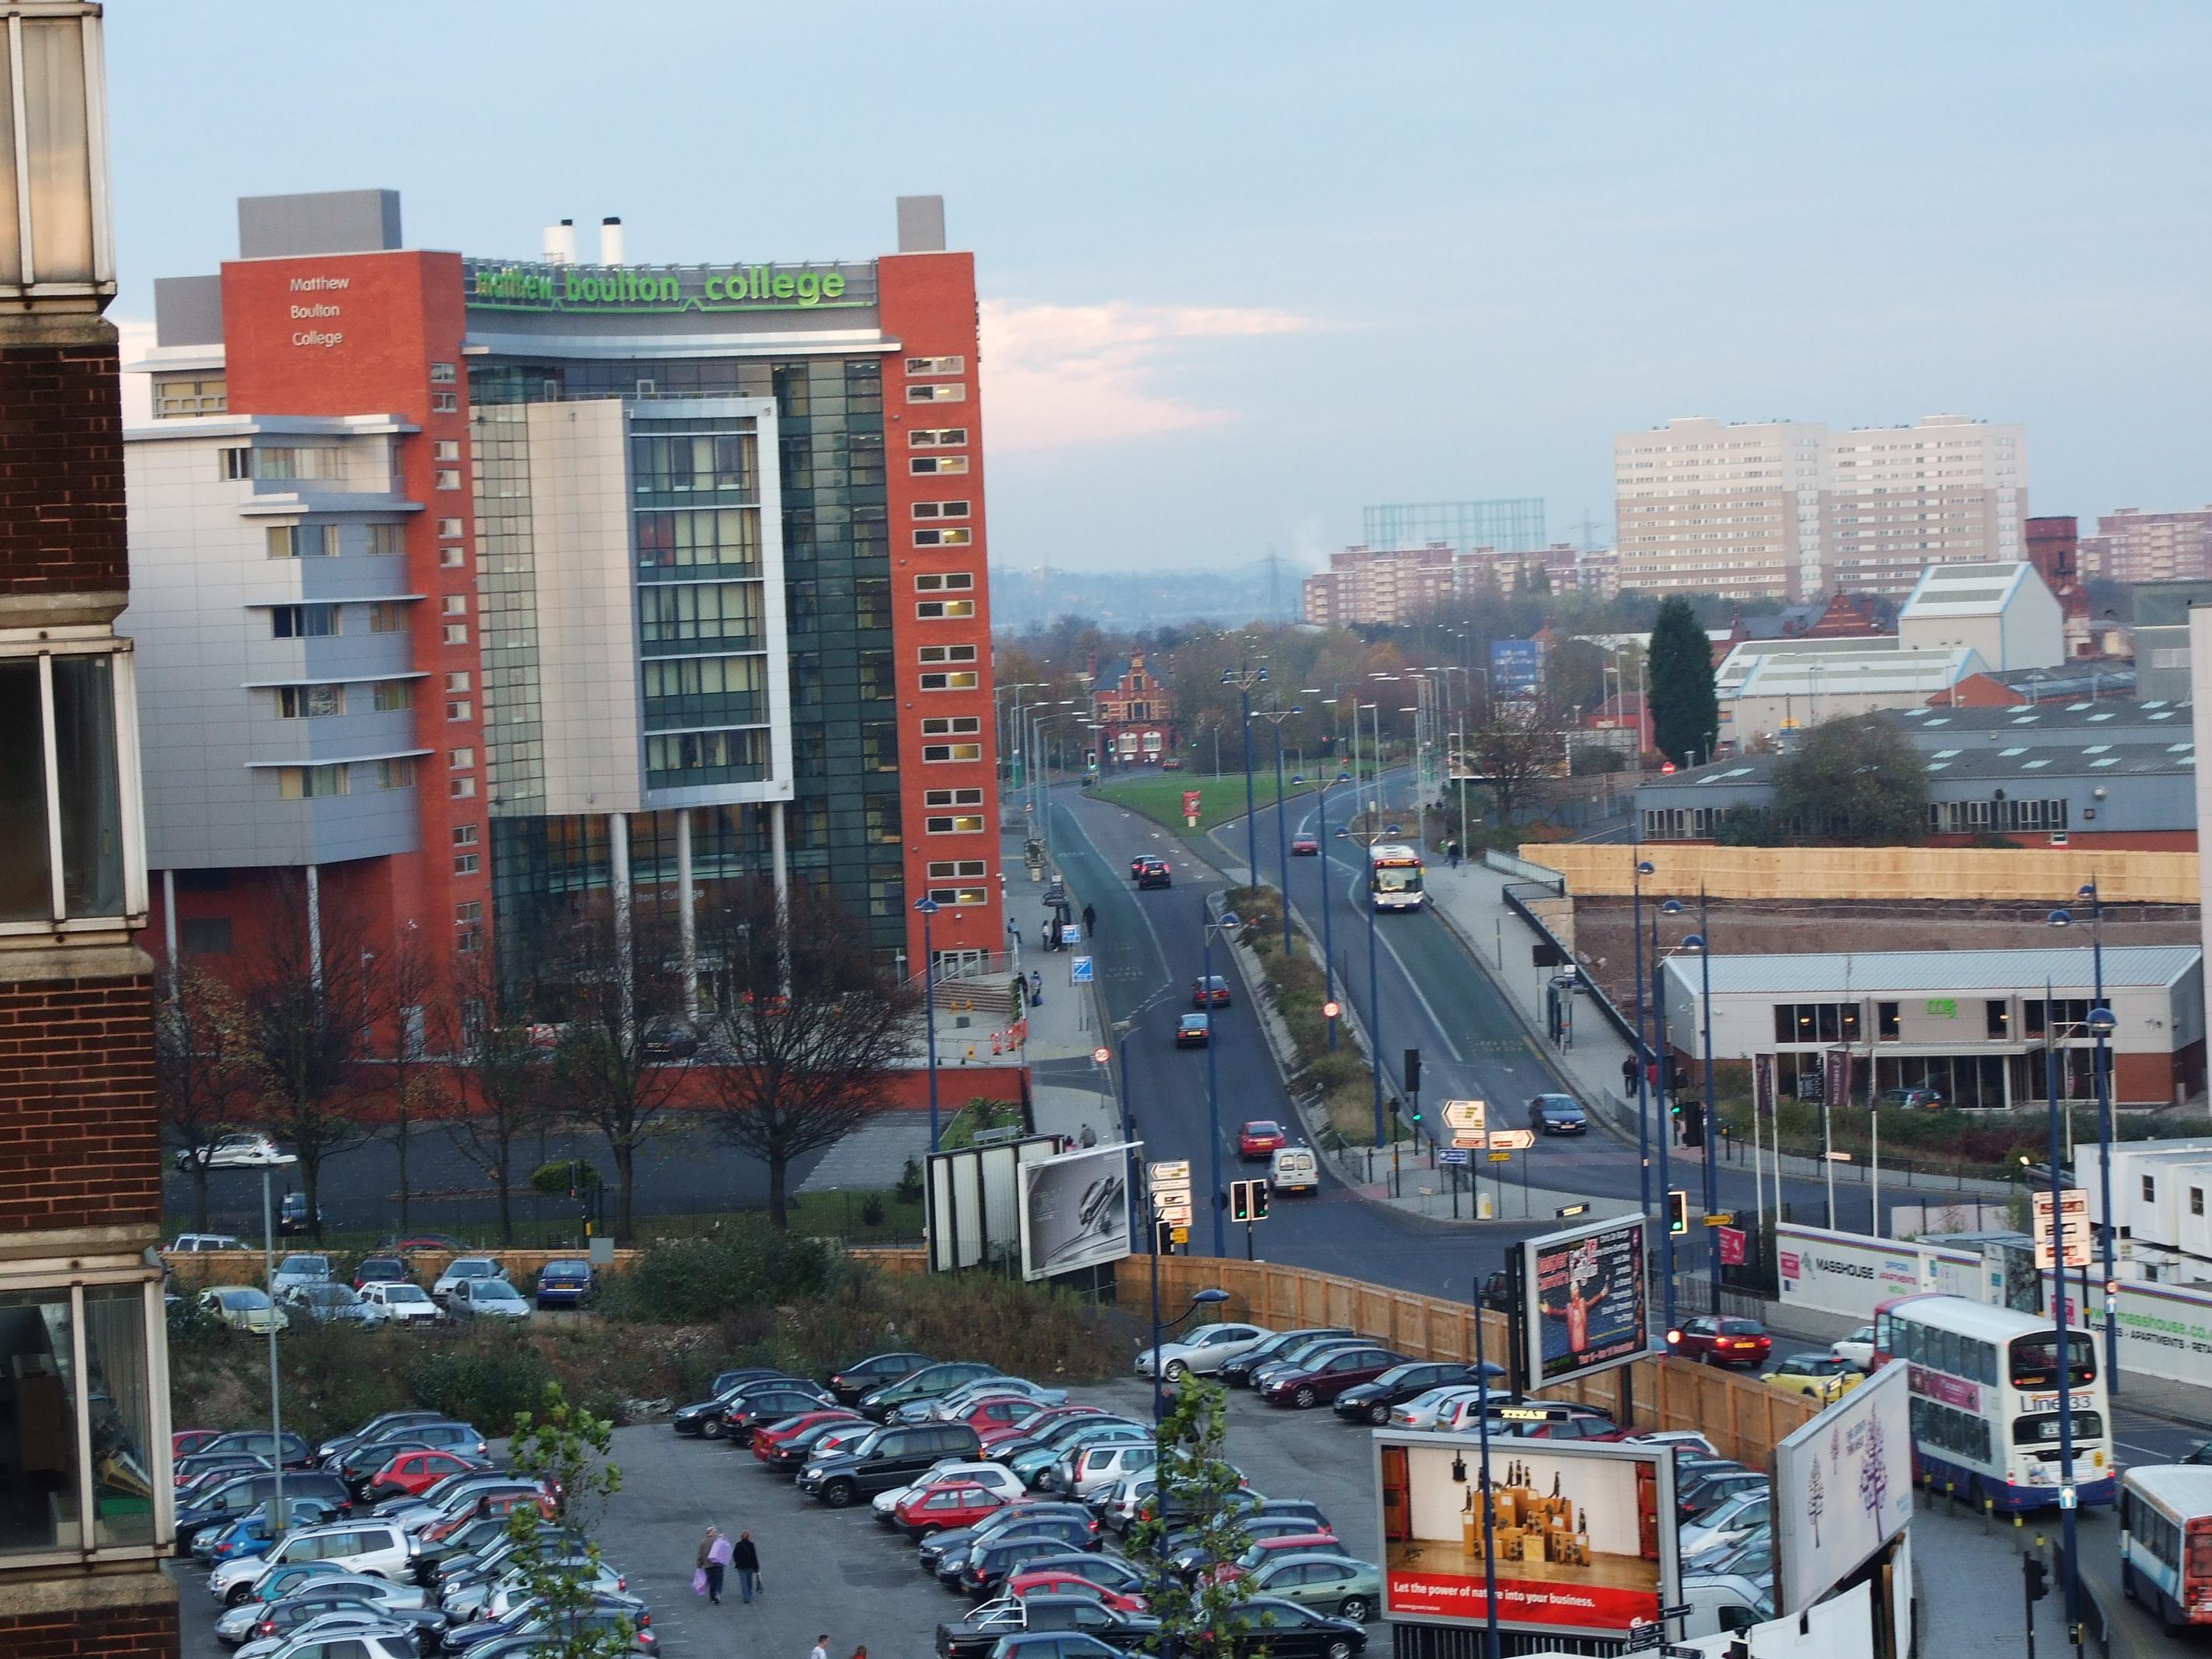 Birmingham skyline, Birmingham, Buildings, Cars, Centre, HQ Photo